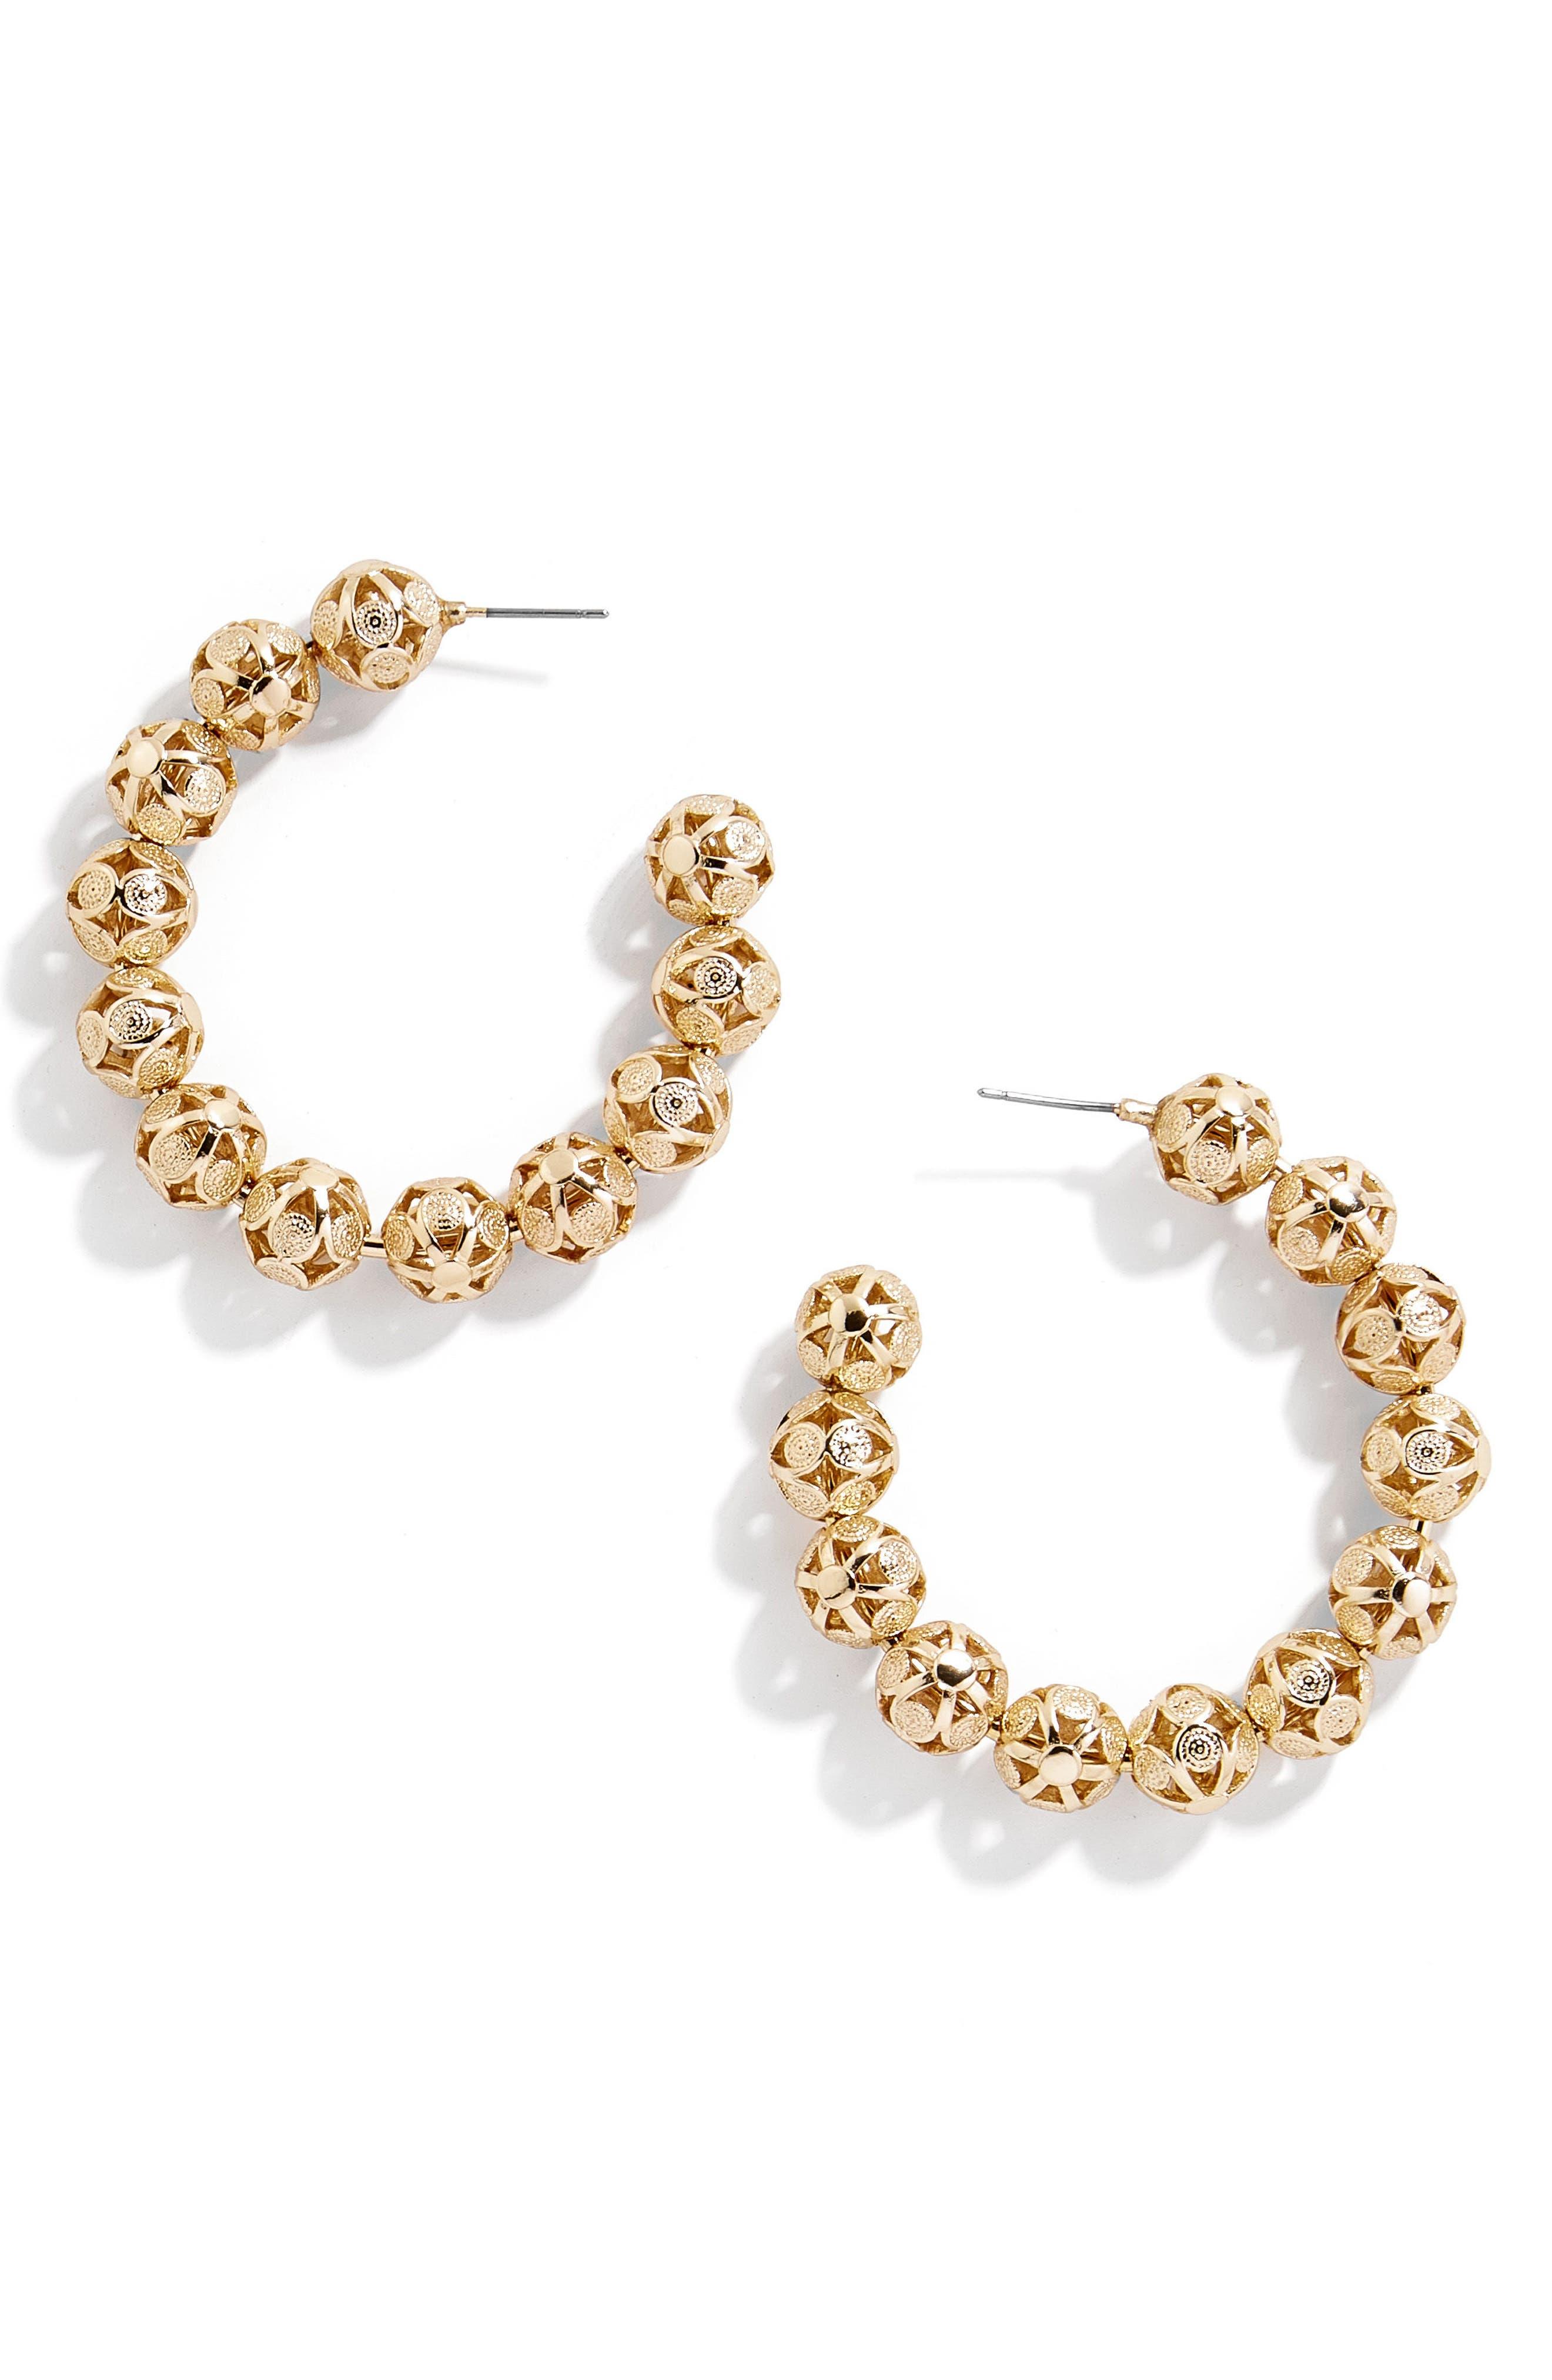 Amora Hoop Earrings,                         Main,                         color, Gold